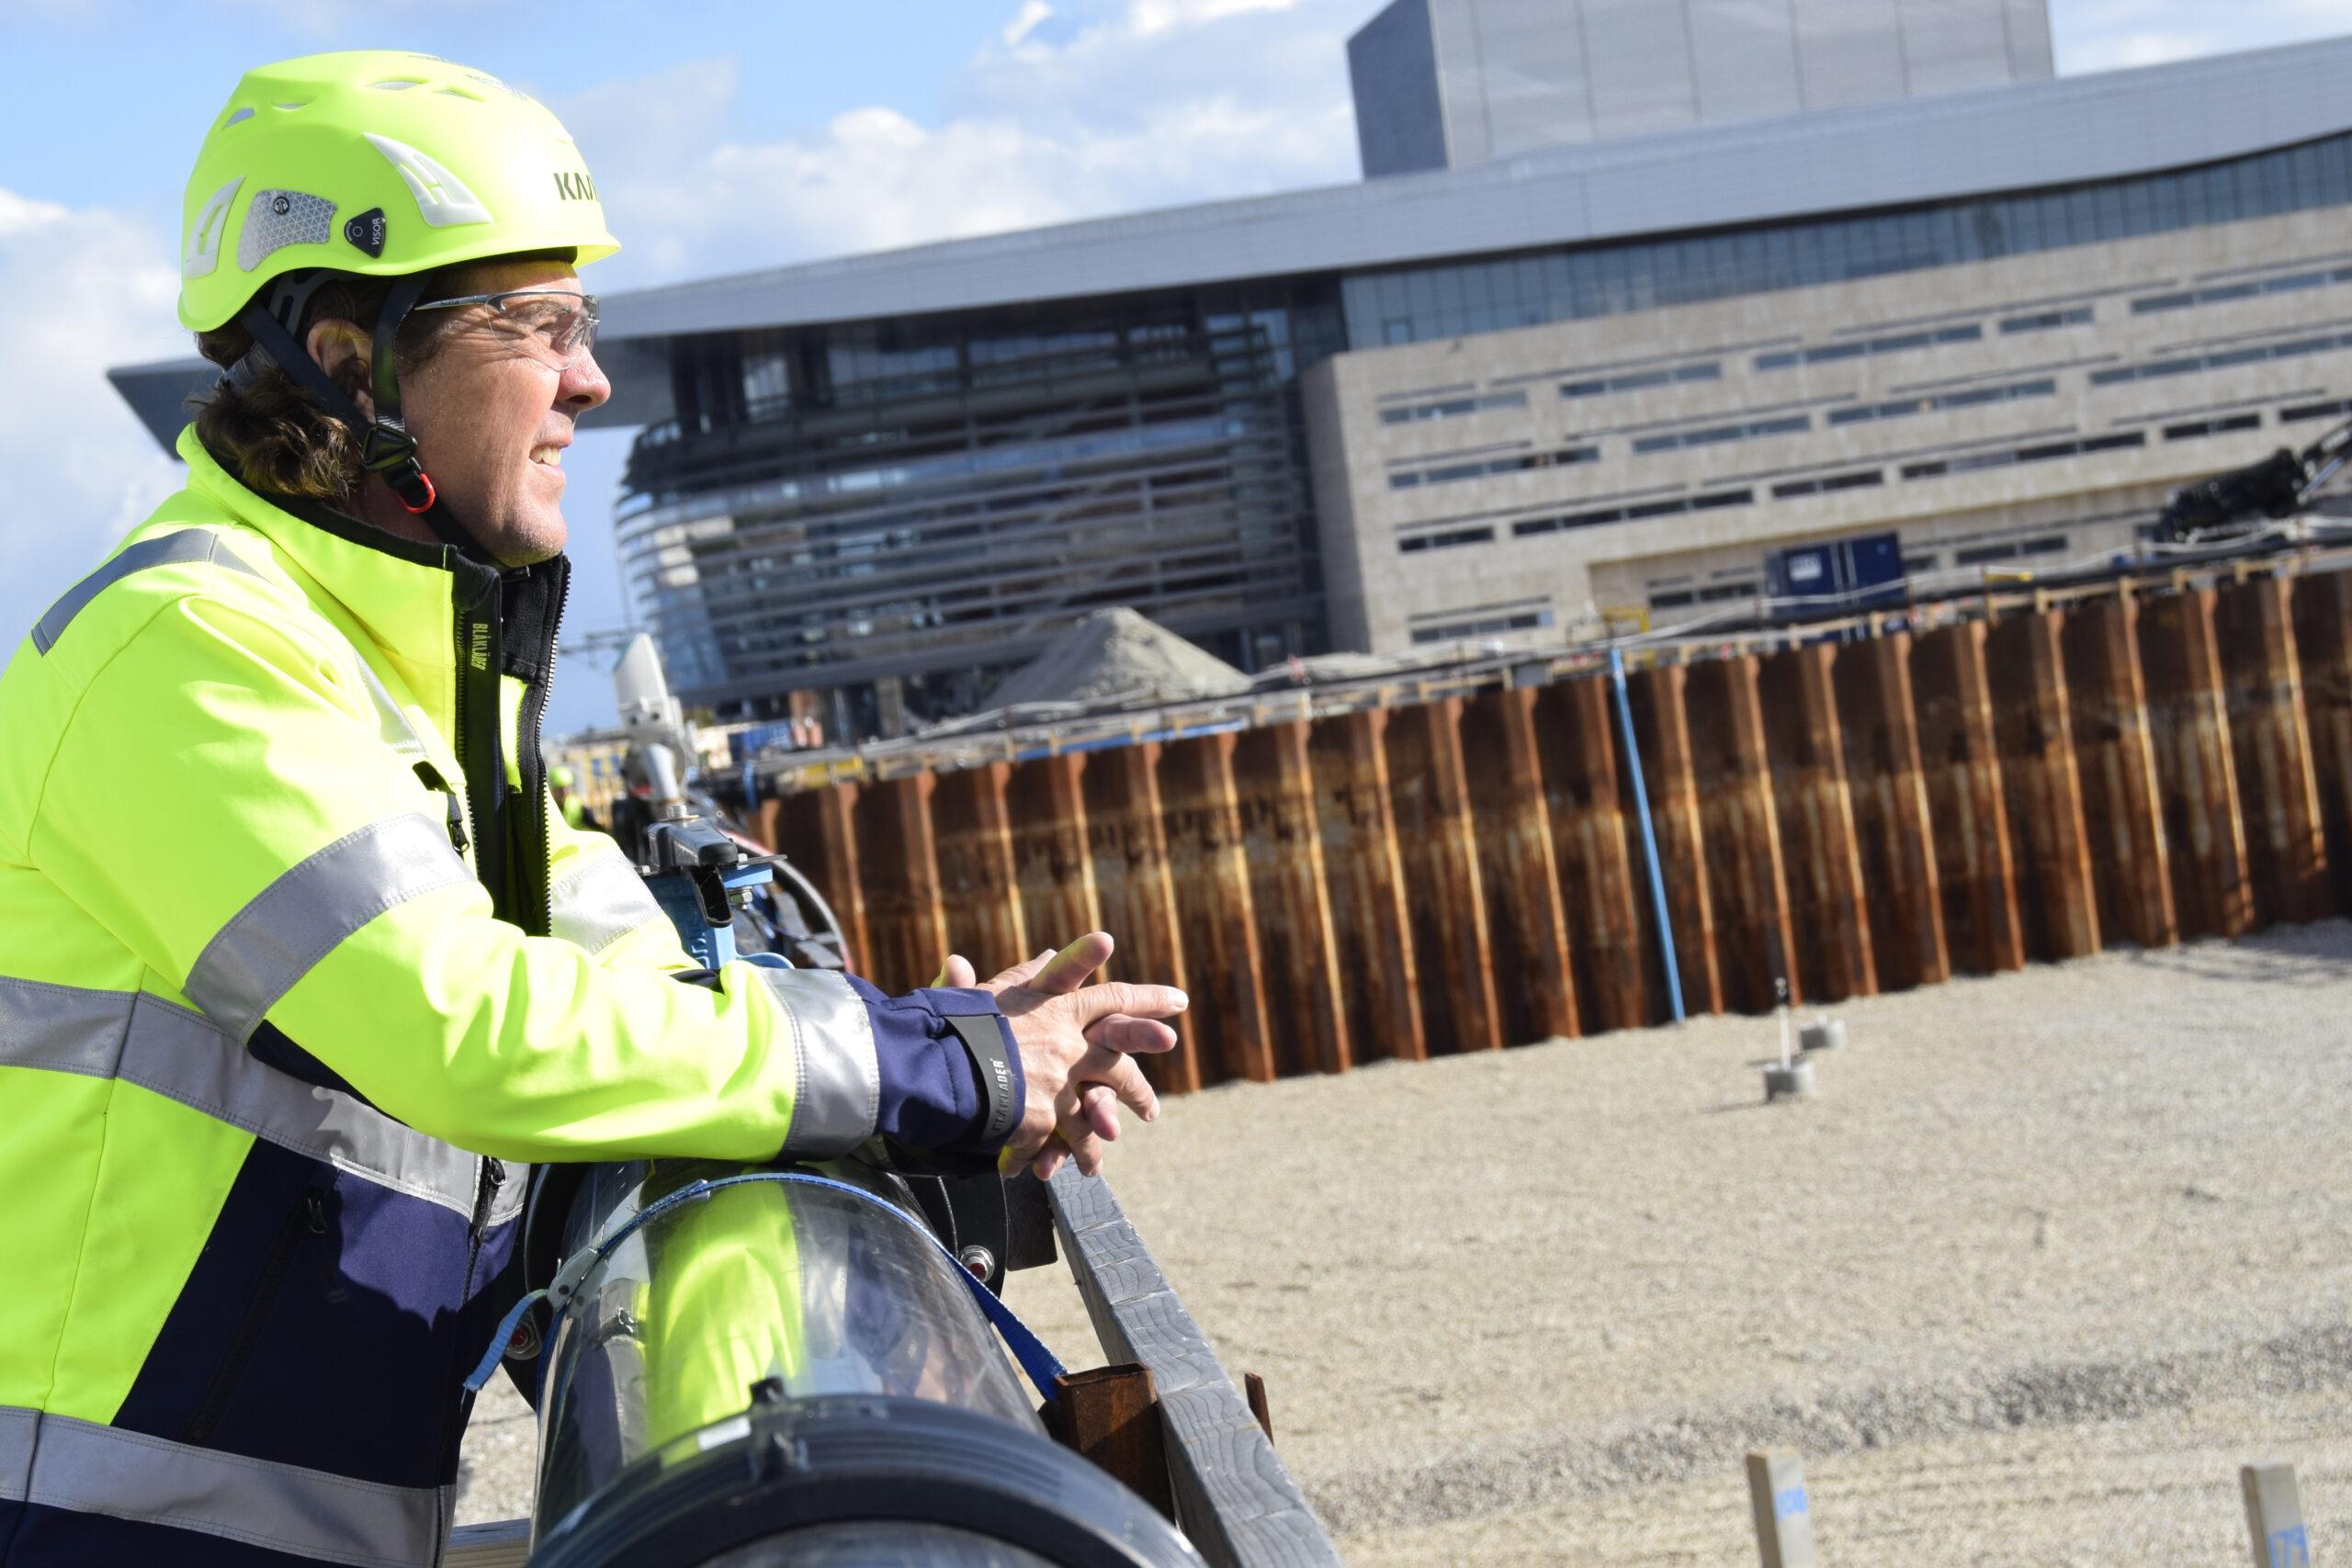 Papirøen - projektdirektør Mikael Dahl-Jensen, NCC